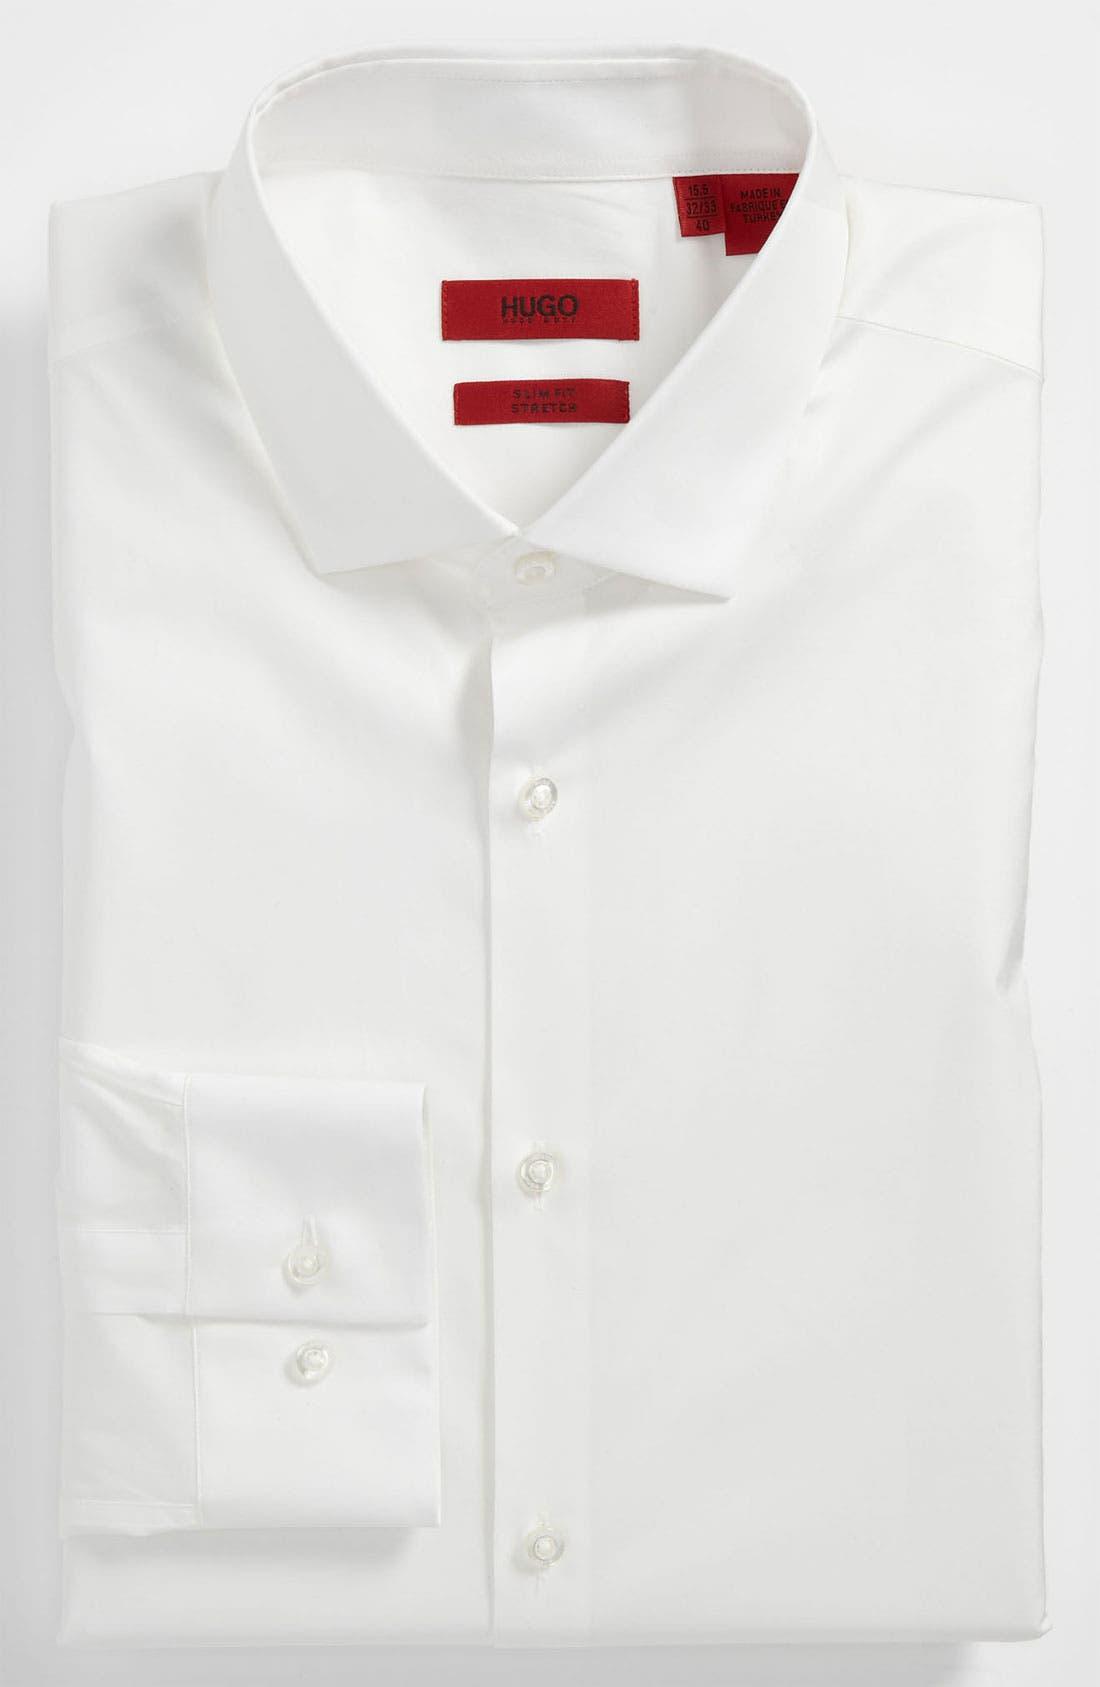 Alternate Image 1 Selected - HUGO Slim Fit Cotton Stretch Dress Shirt